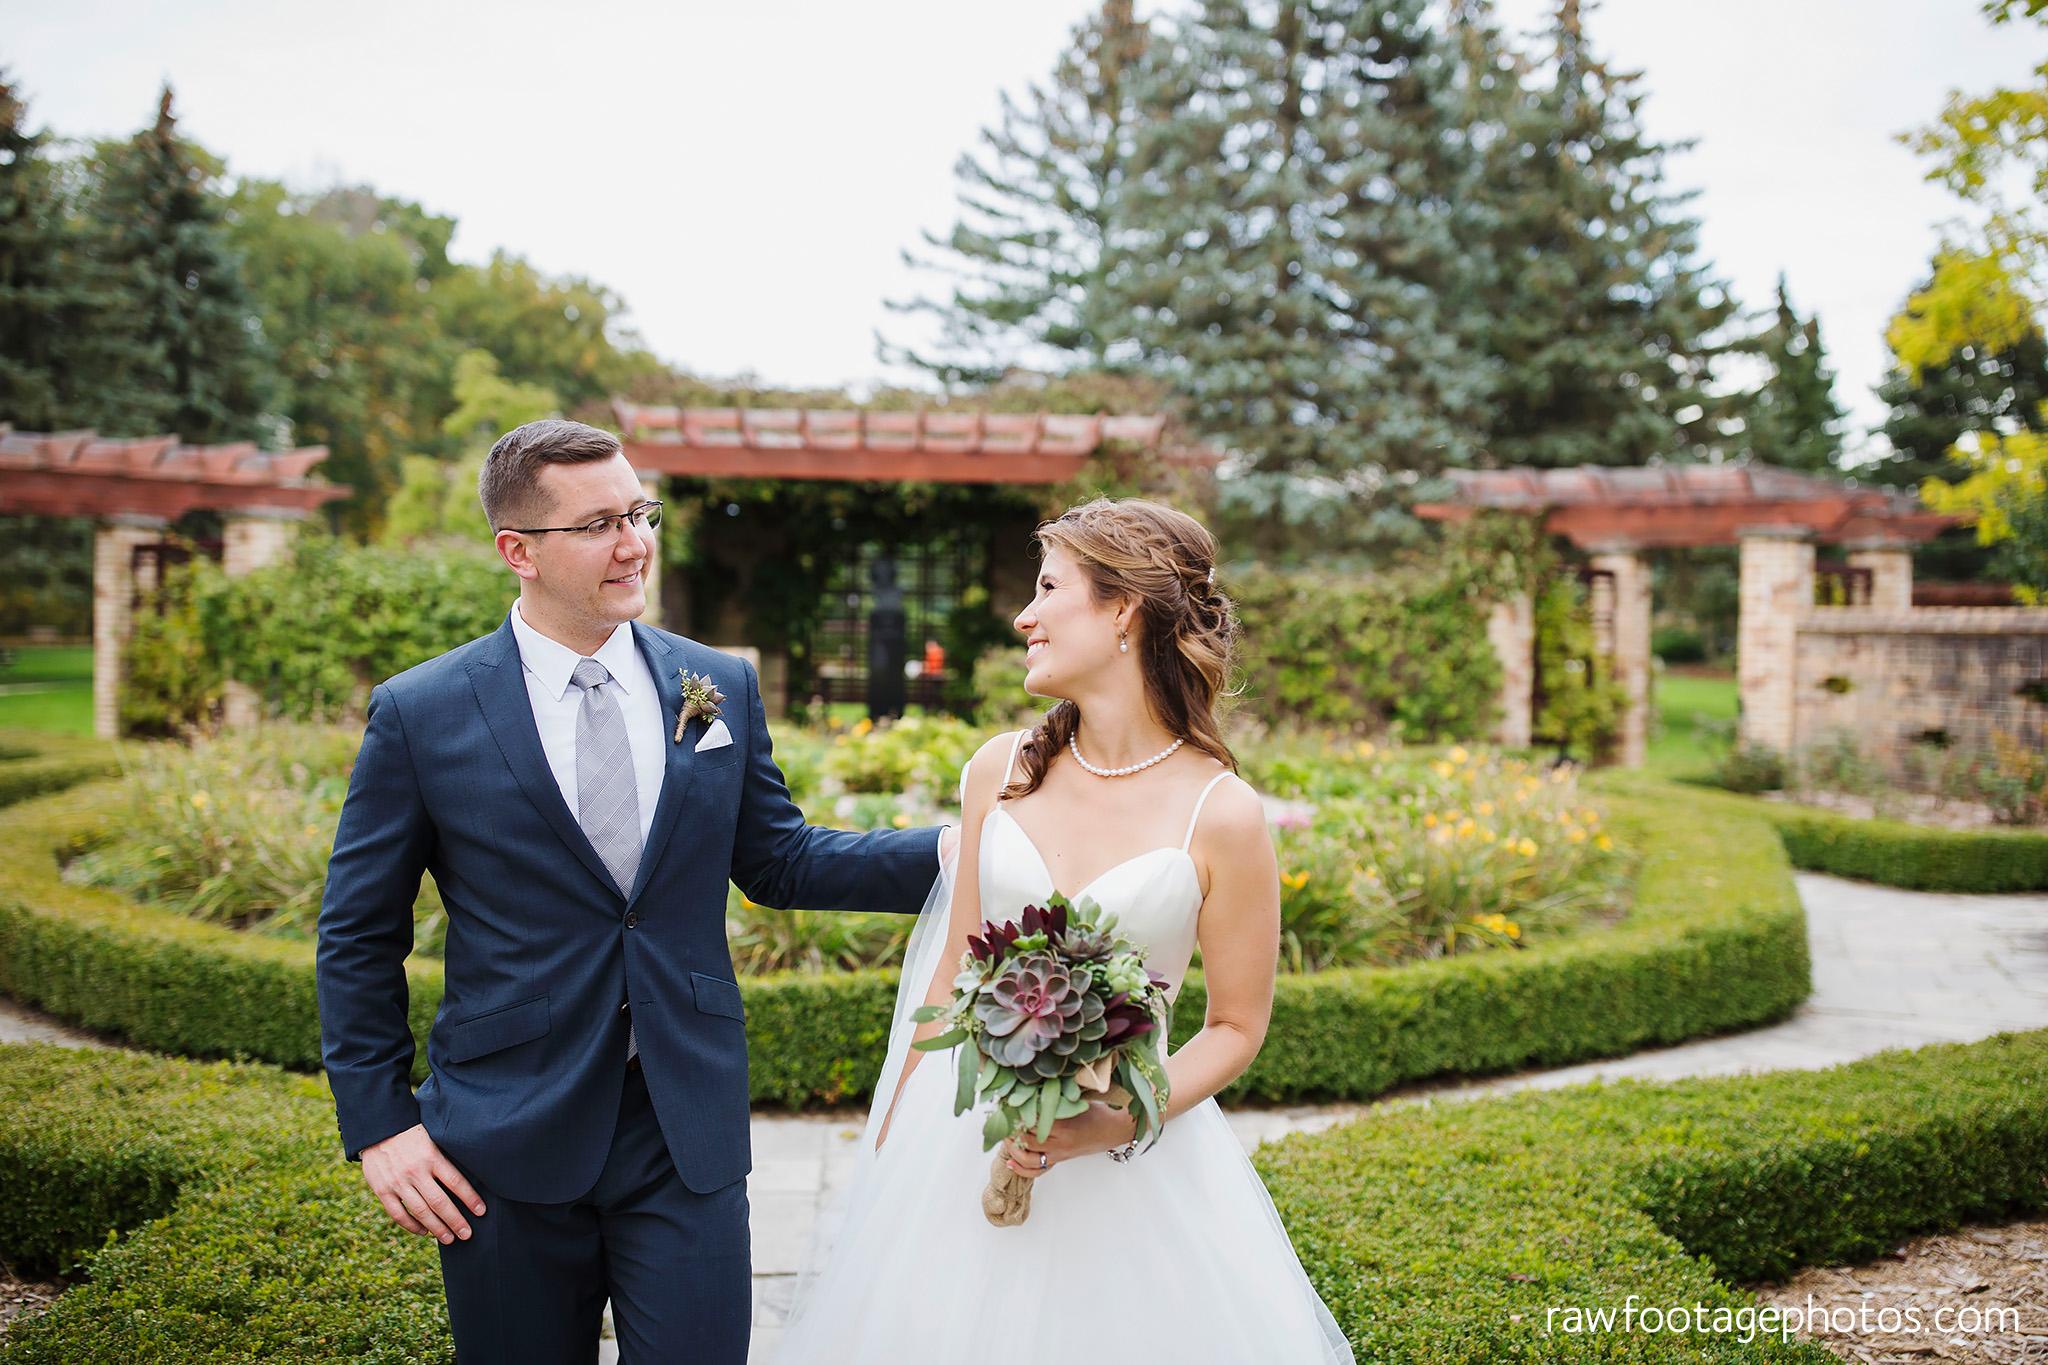 london_ontario_wedding_photographer-civic_gardens-springbank_park-succulent_bouquet-fall_wedding-bridge-raw_footage_photography054.jpg